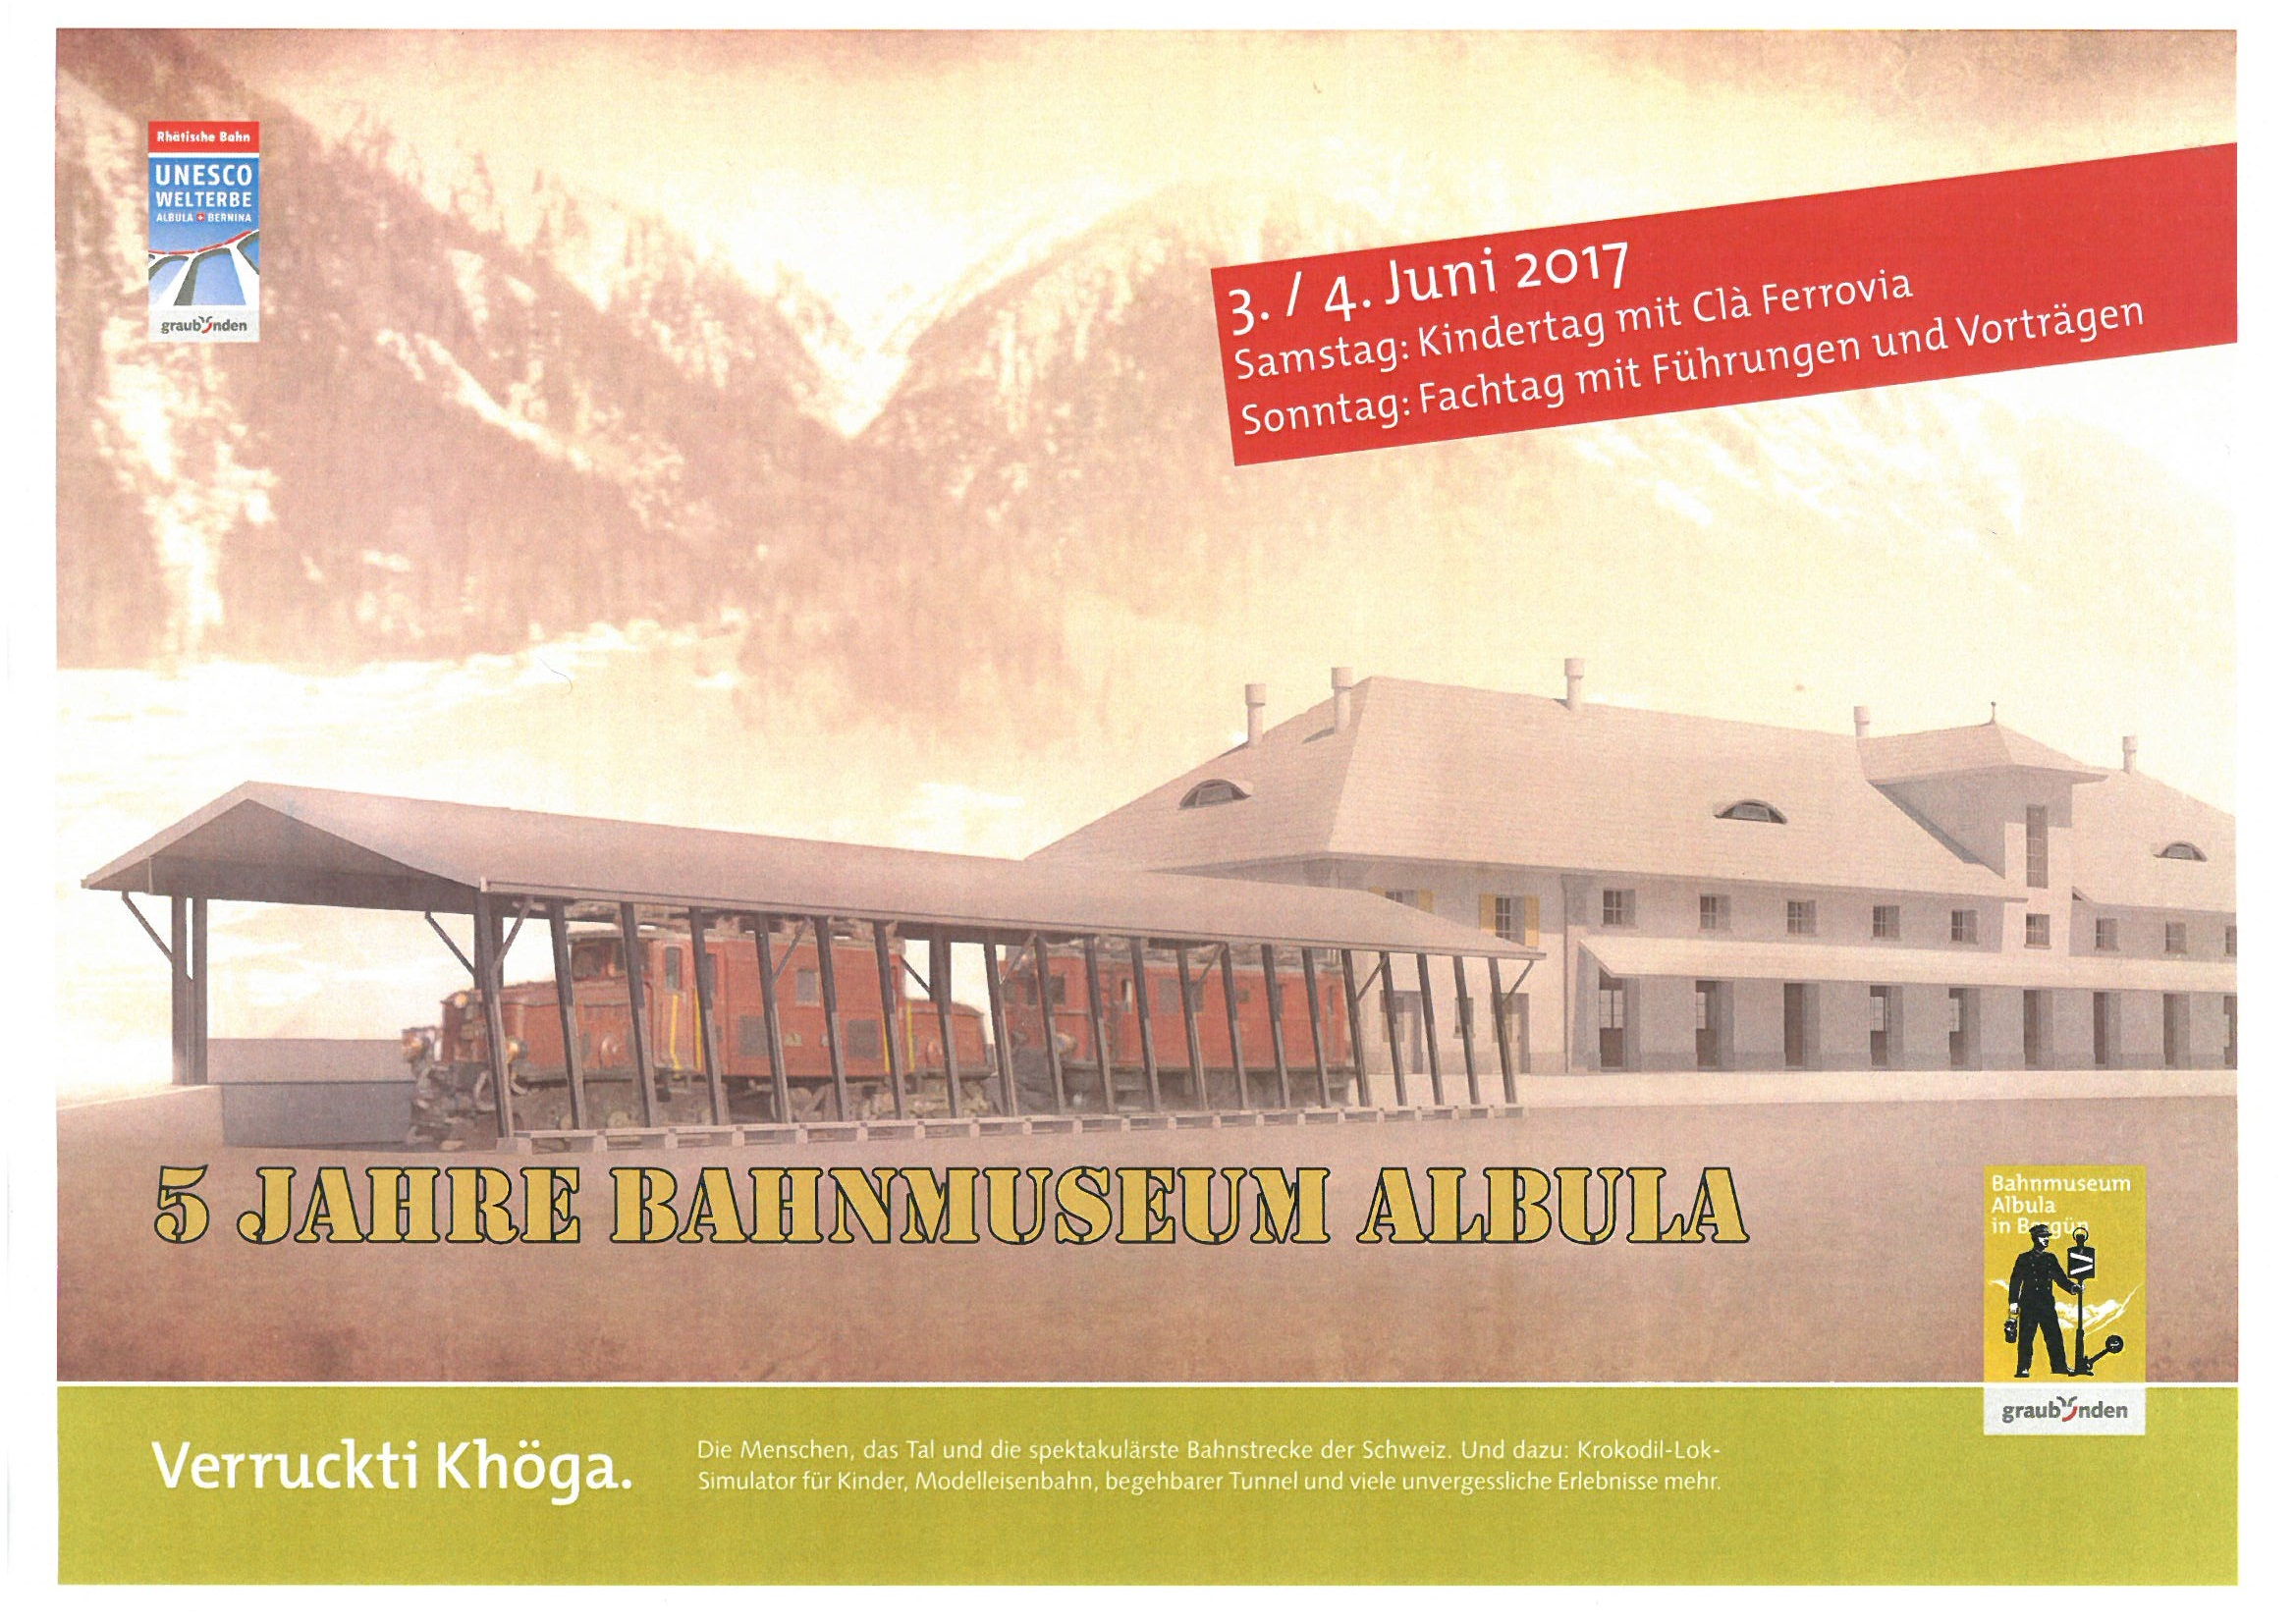 5 Jahre Bahnmuseum Albula